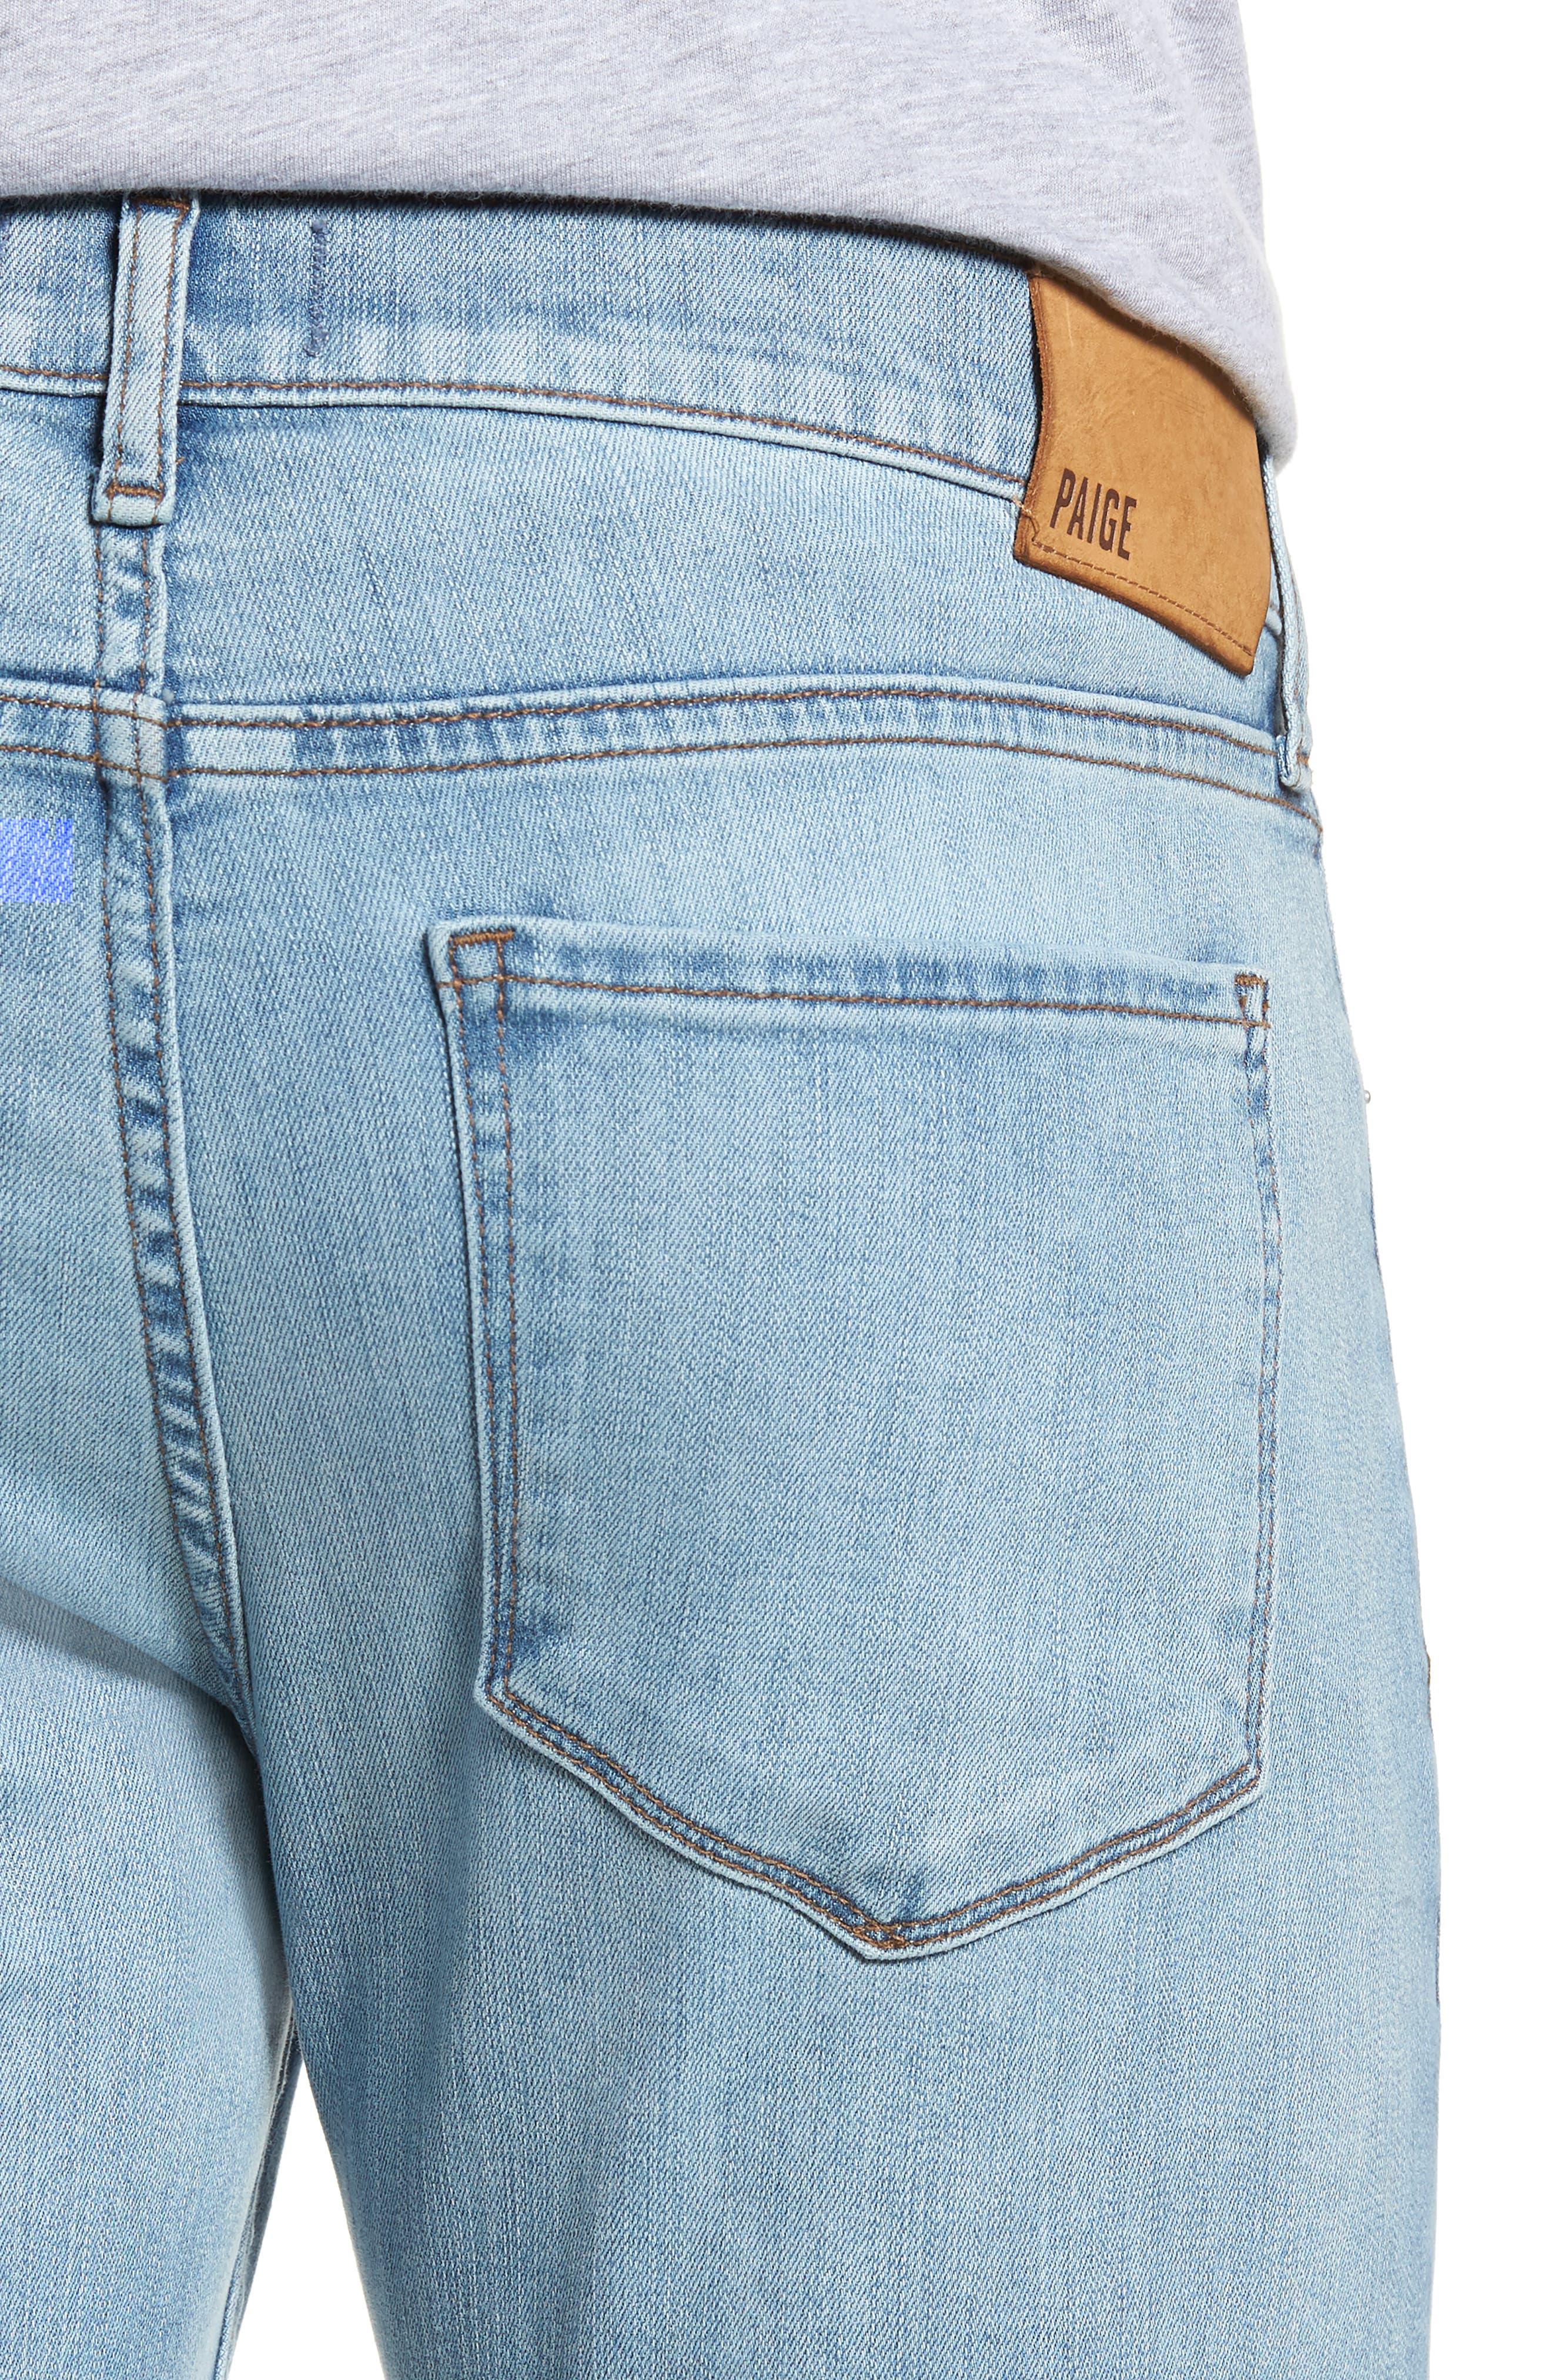 Transcend Vintage - Lennox Slim Fit Jeans,                             Alternate thumbnail 4, color,                             DENVER